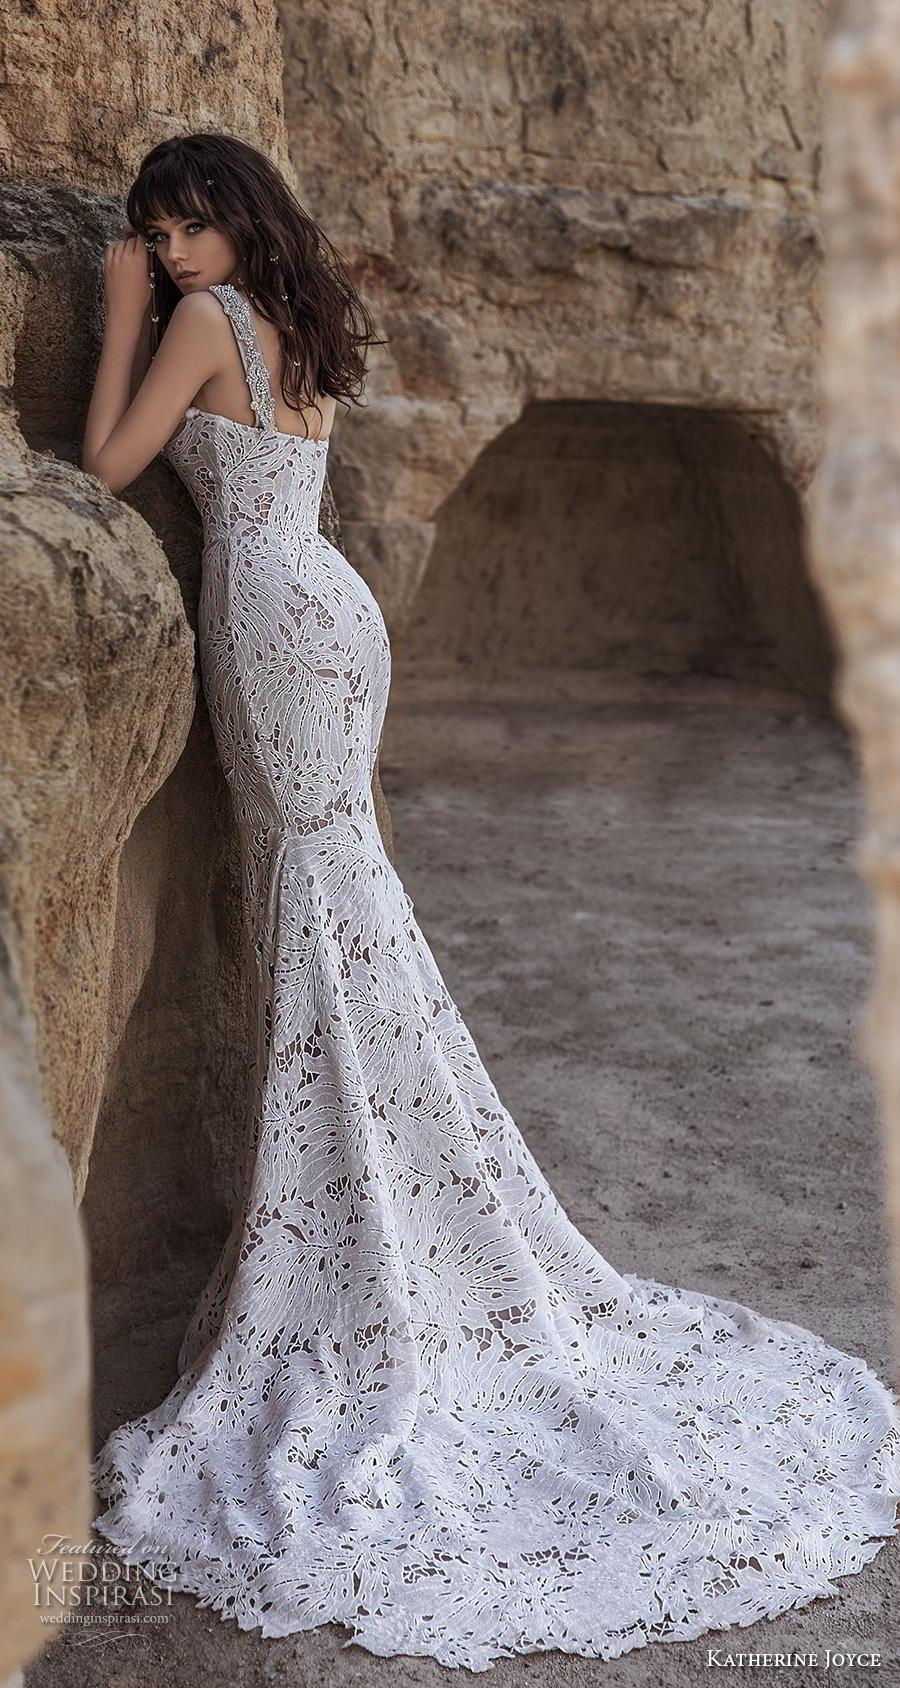 katherine joyce 2020 bridal sleeveless thick strap sweetheart neckline full embellishment elegant fit and flare wedding dress mid back chapel train (15) bv